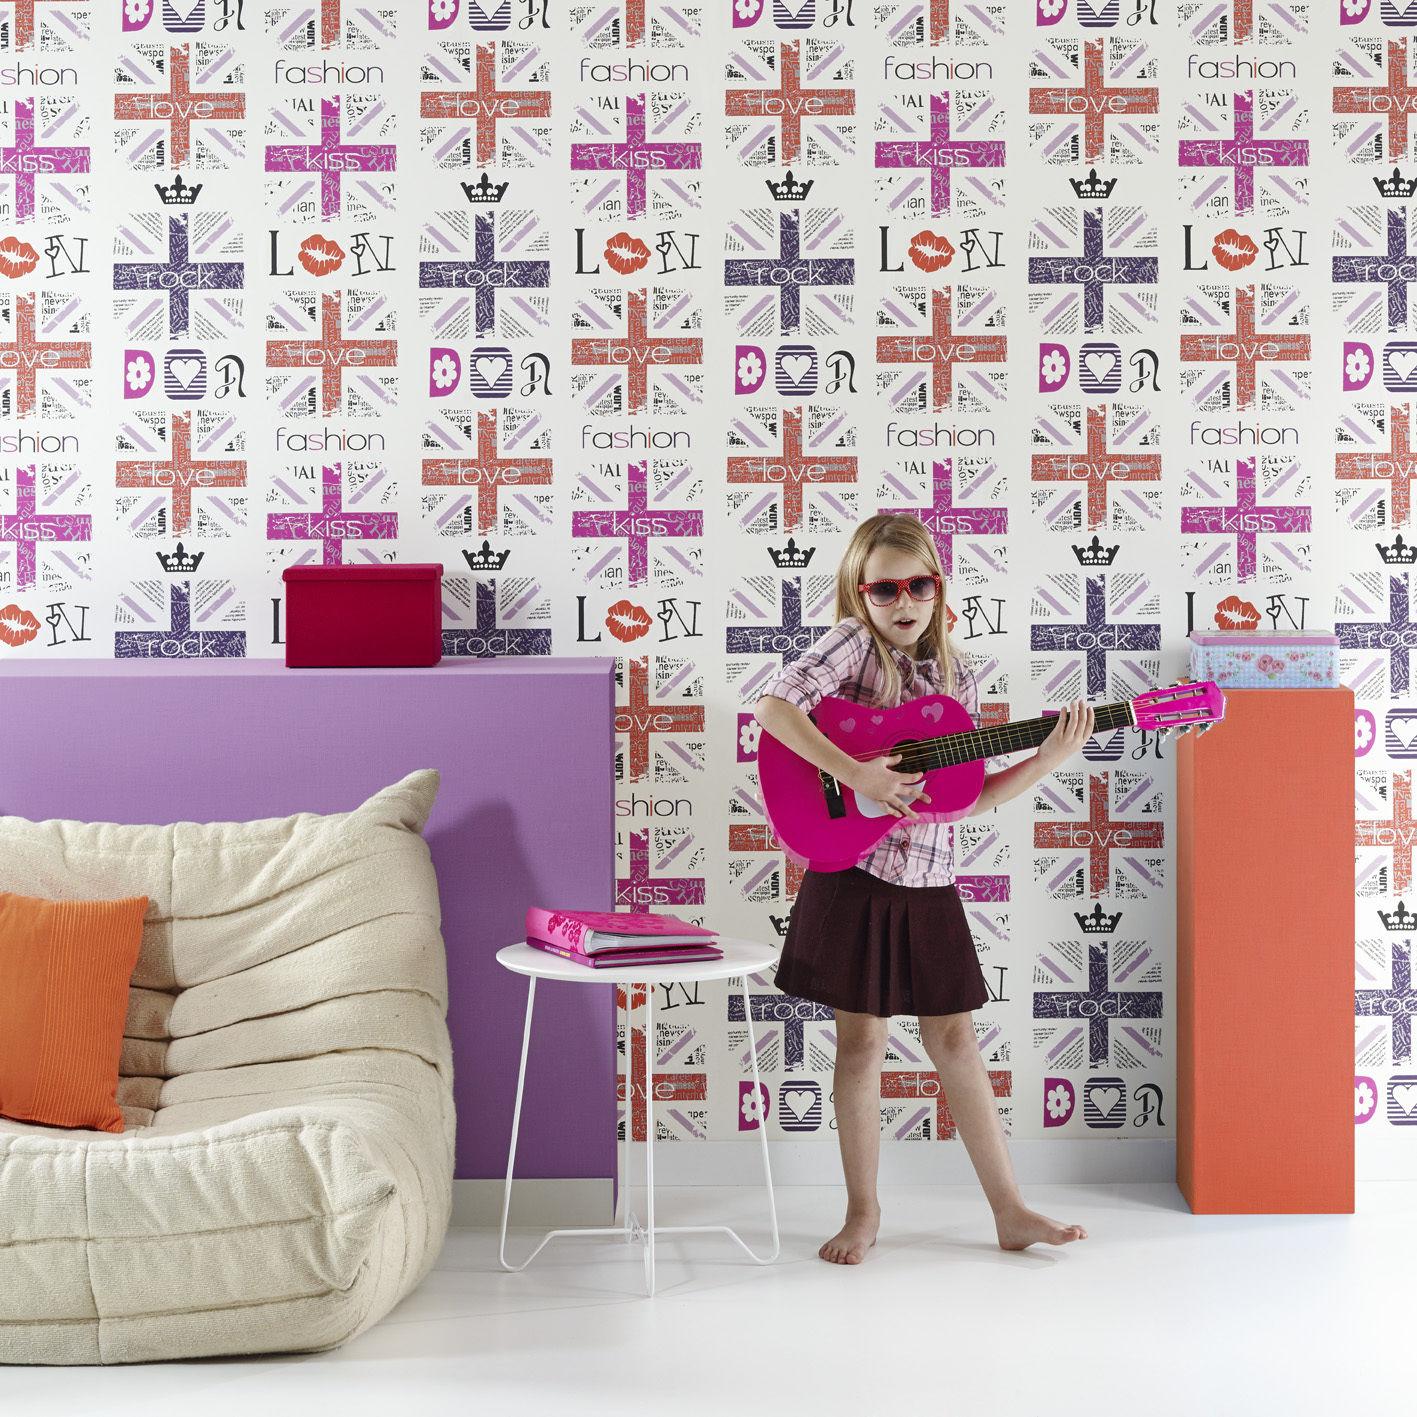 Vlies Tapete Fashion Style Jugend Zimmer Girls Tapete Weiss Turkis